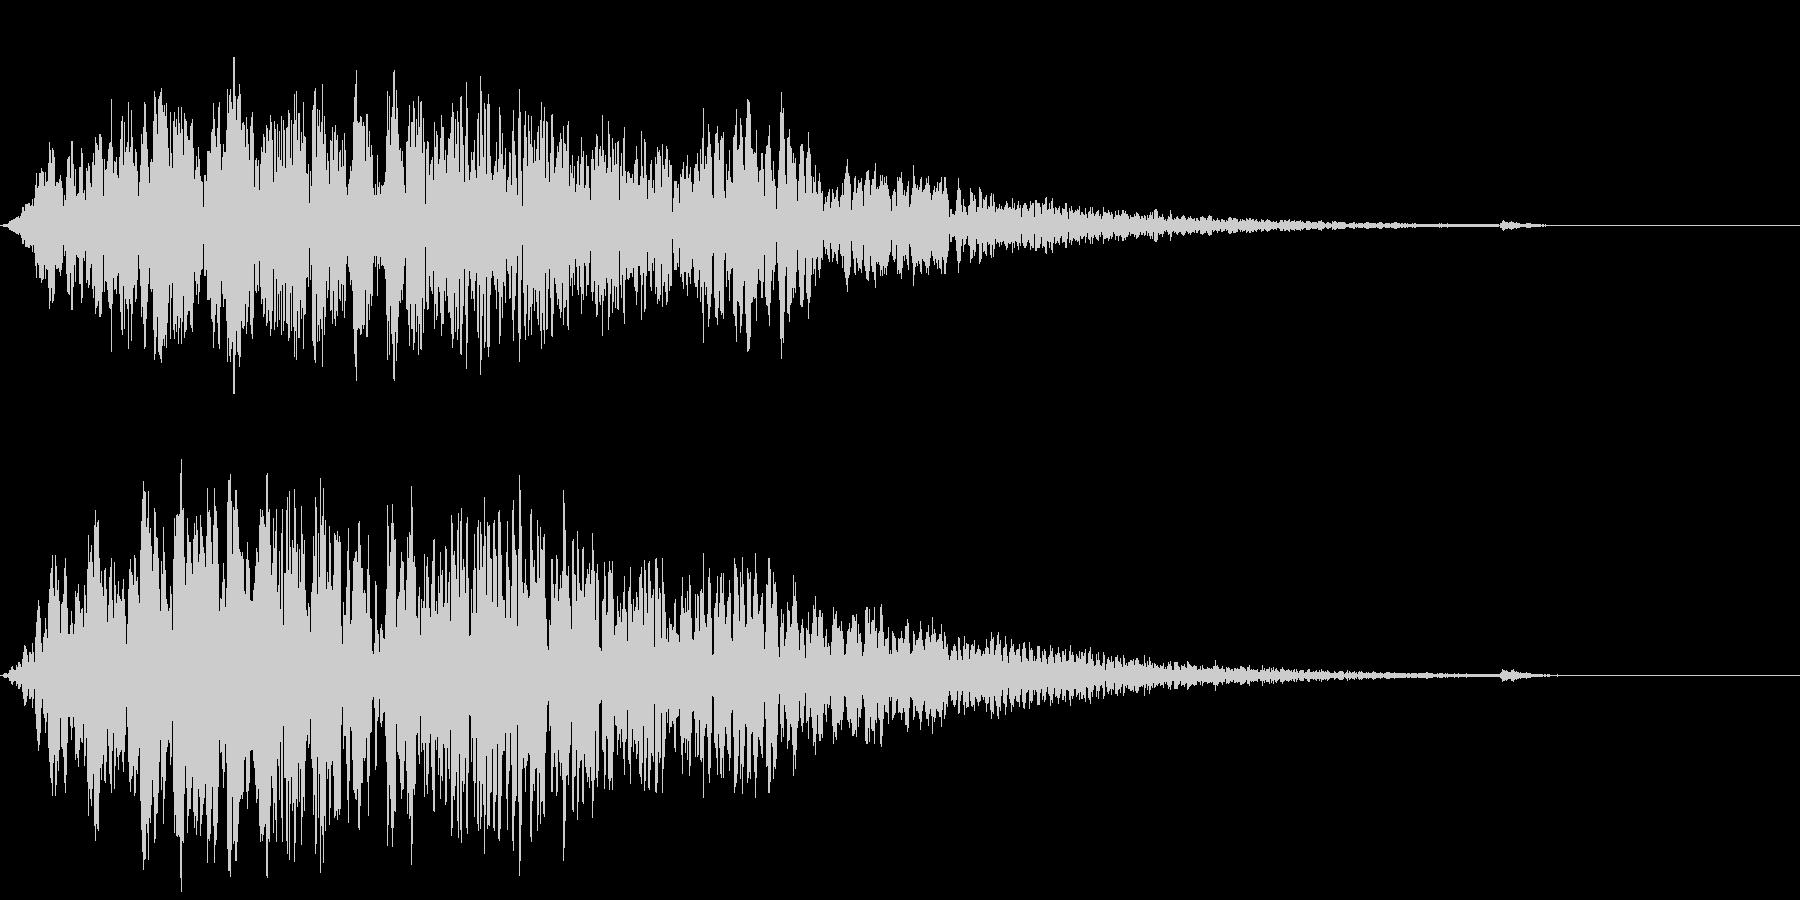 CINEMATIC DARK SFX2の未再生の波形